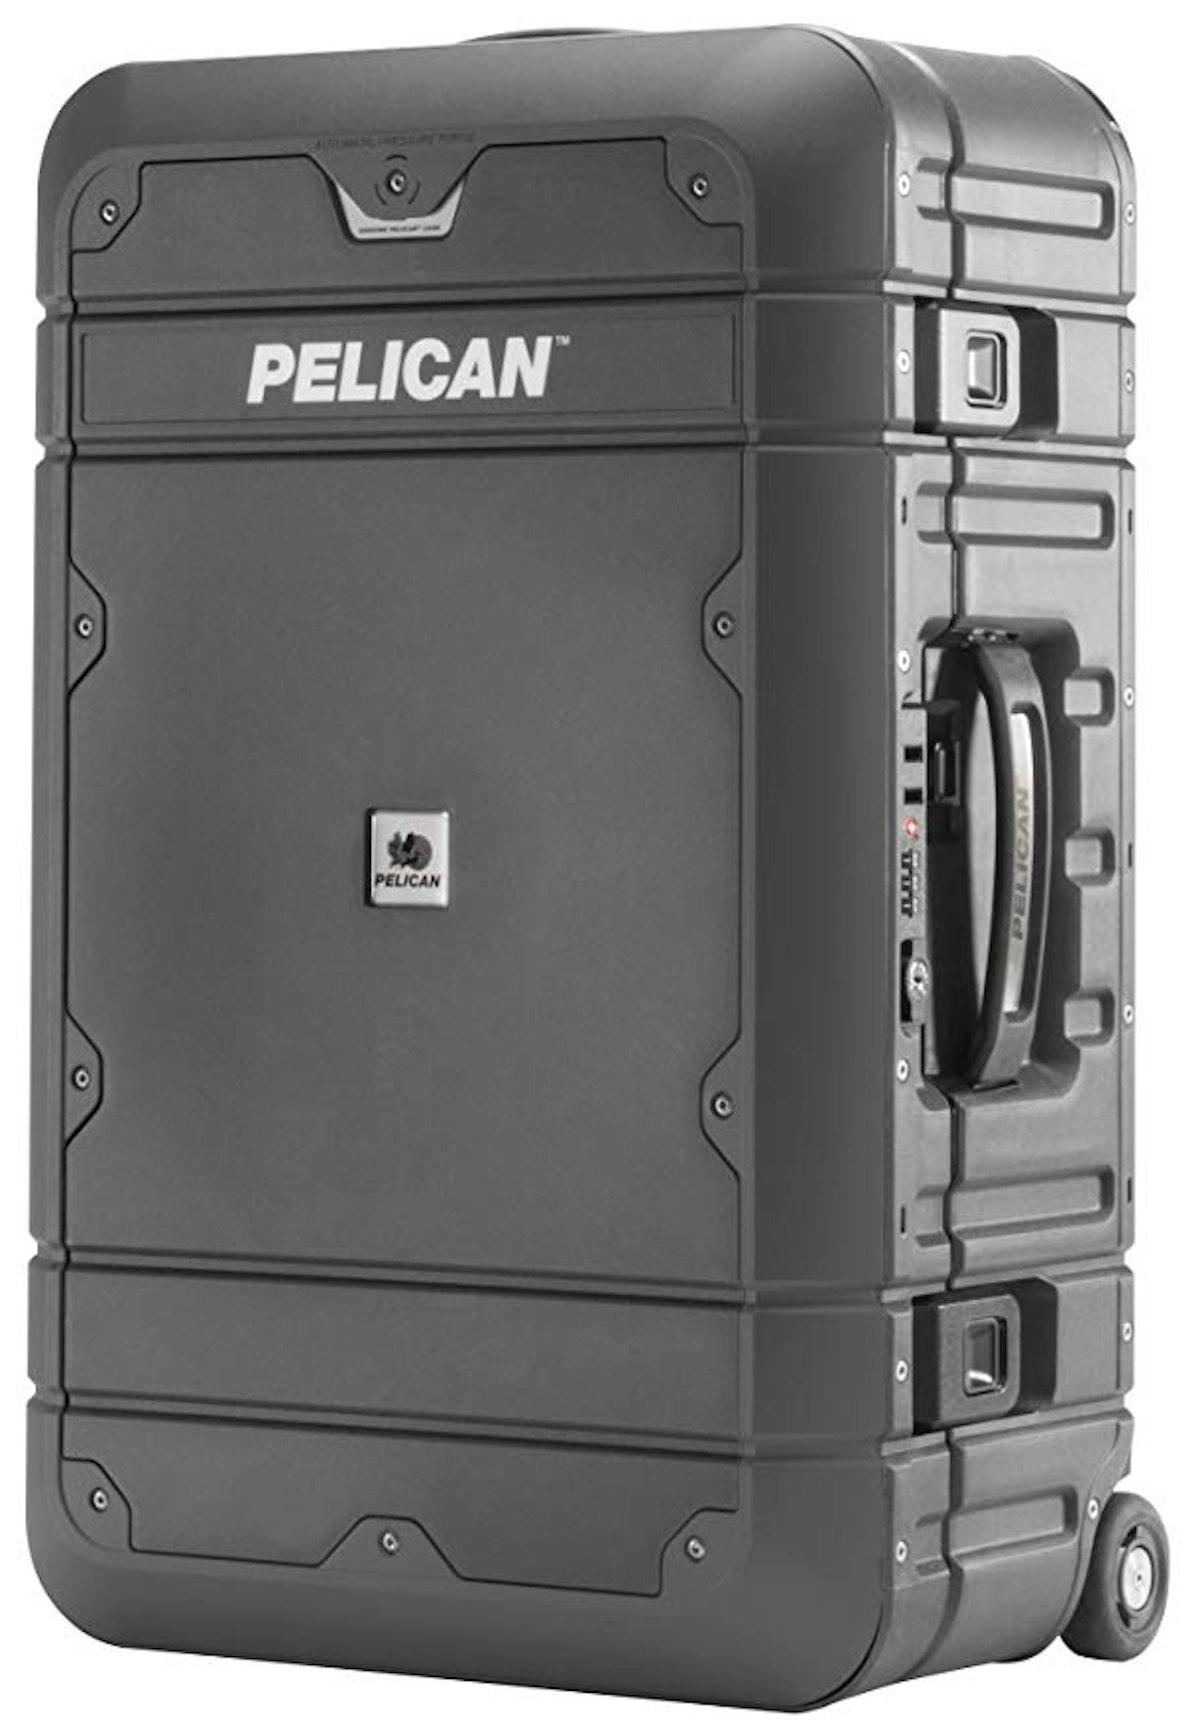 Pelican Elite Luggage BA22